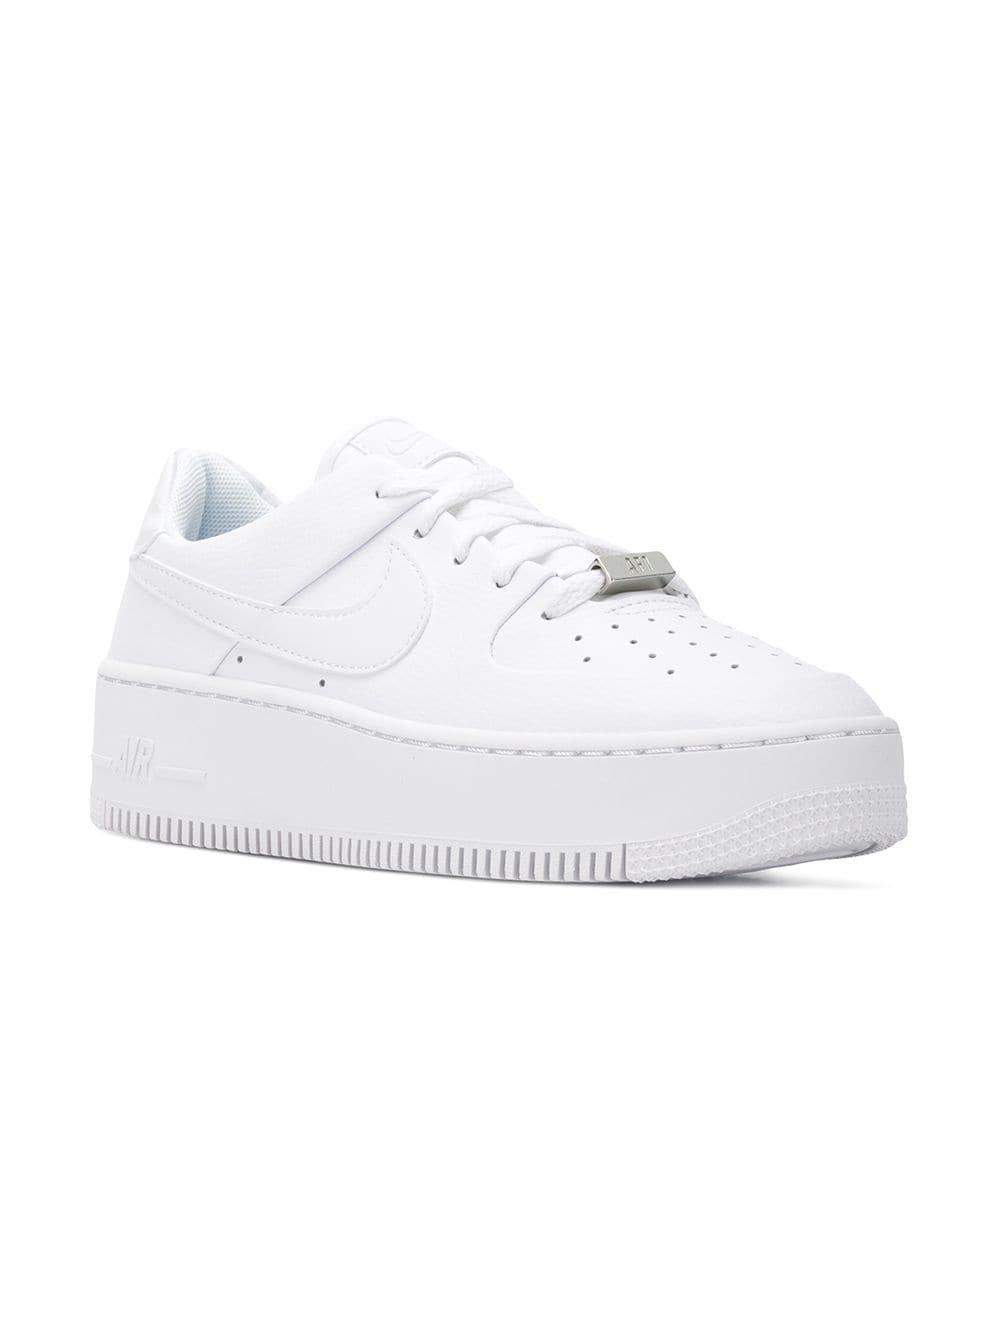 Nike Air Force 1 Sneakers - Farfetch